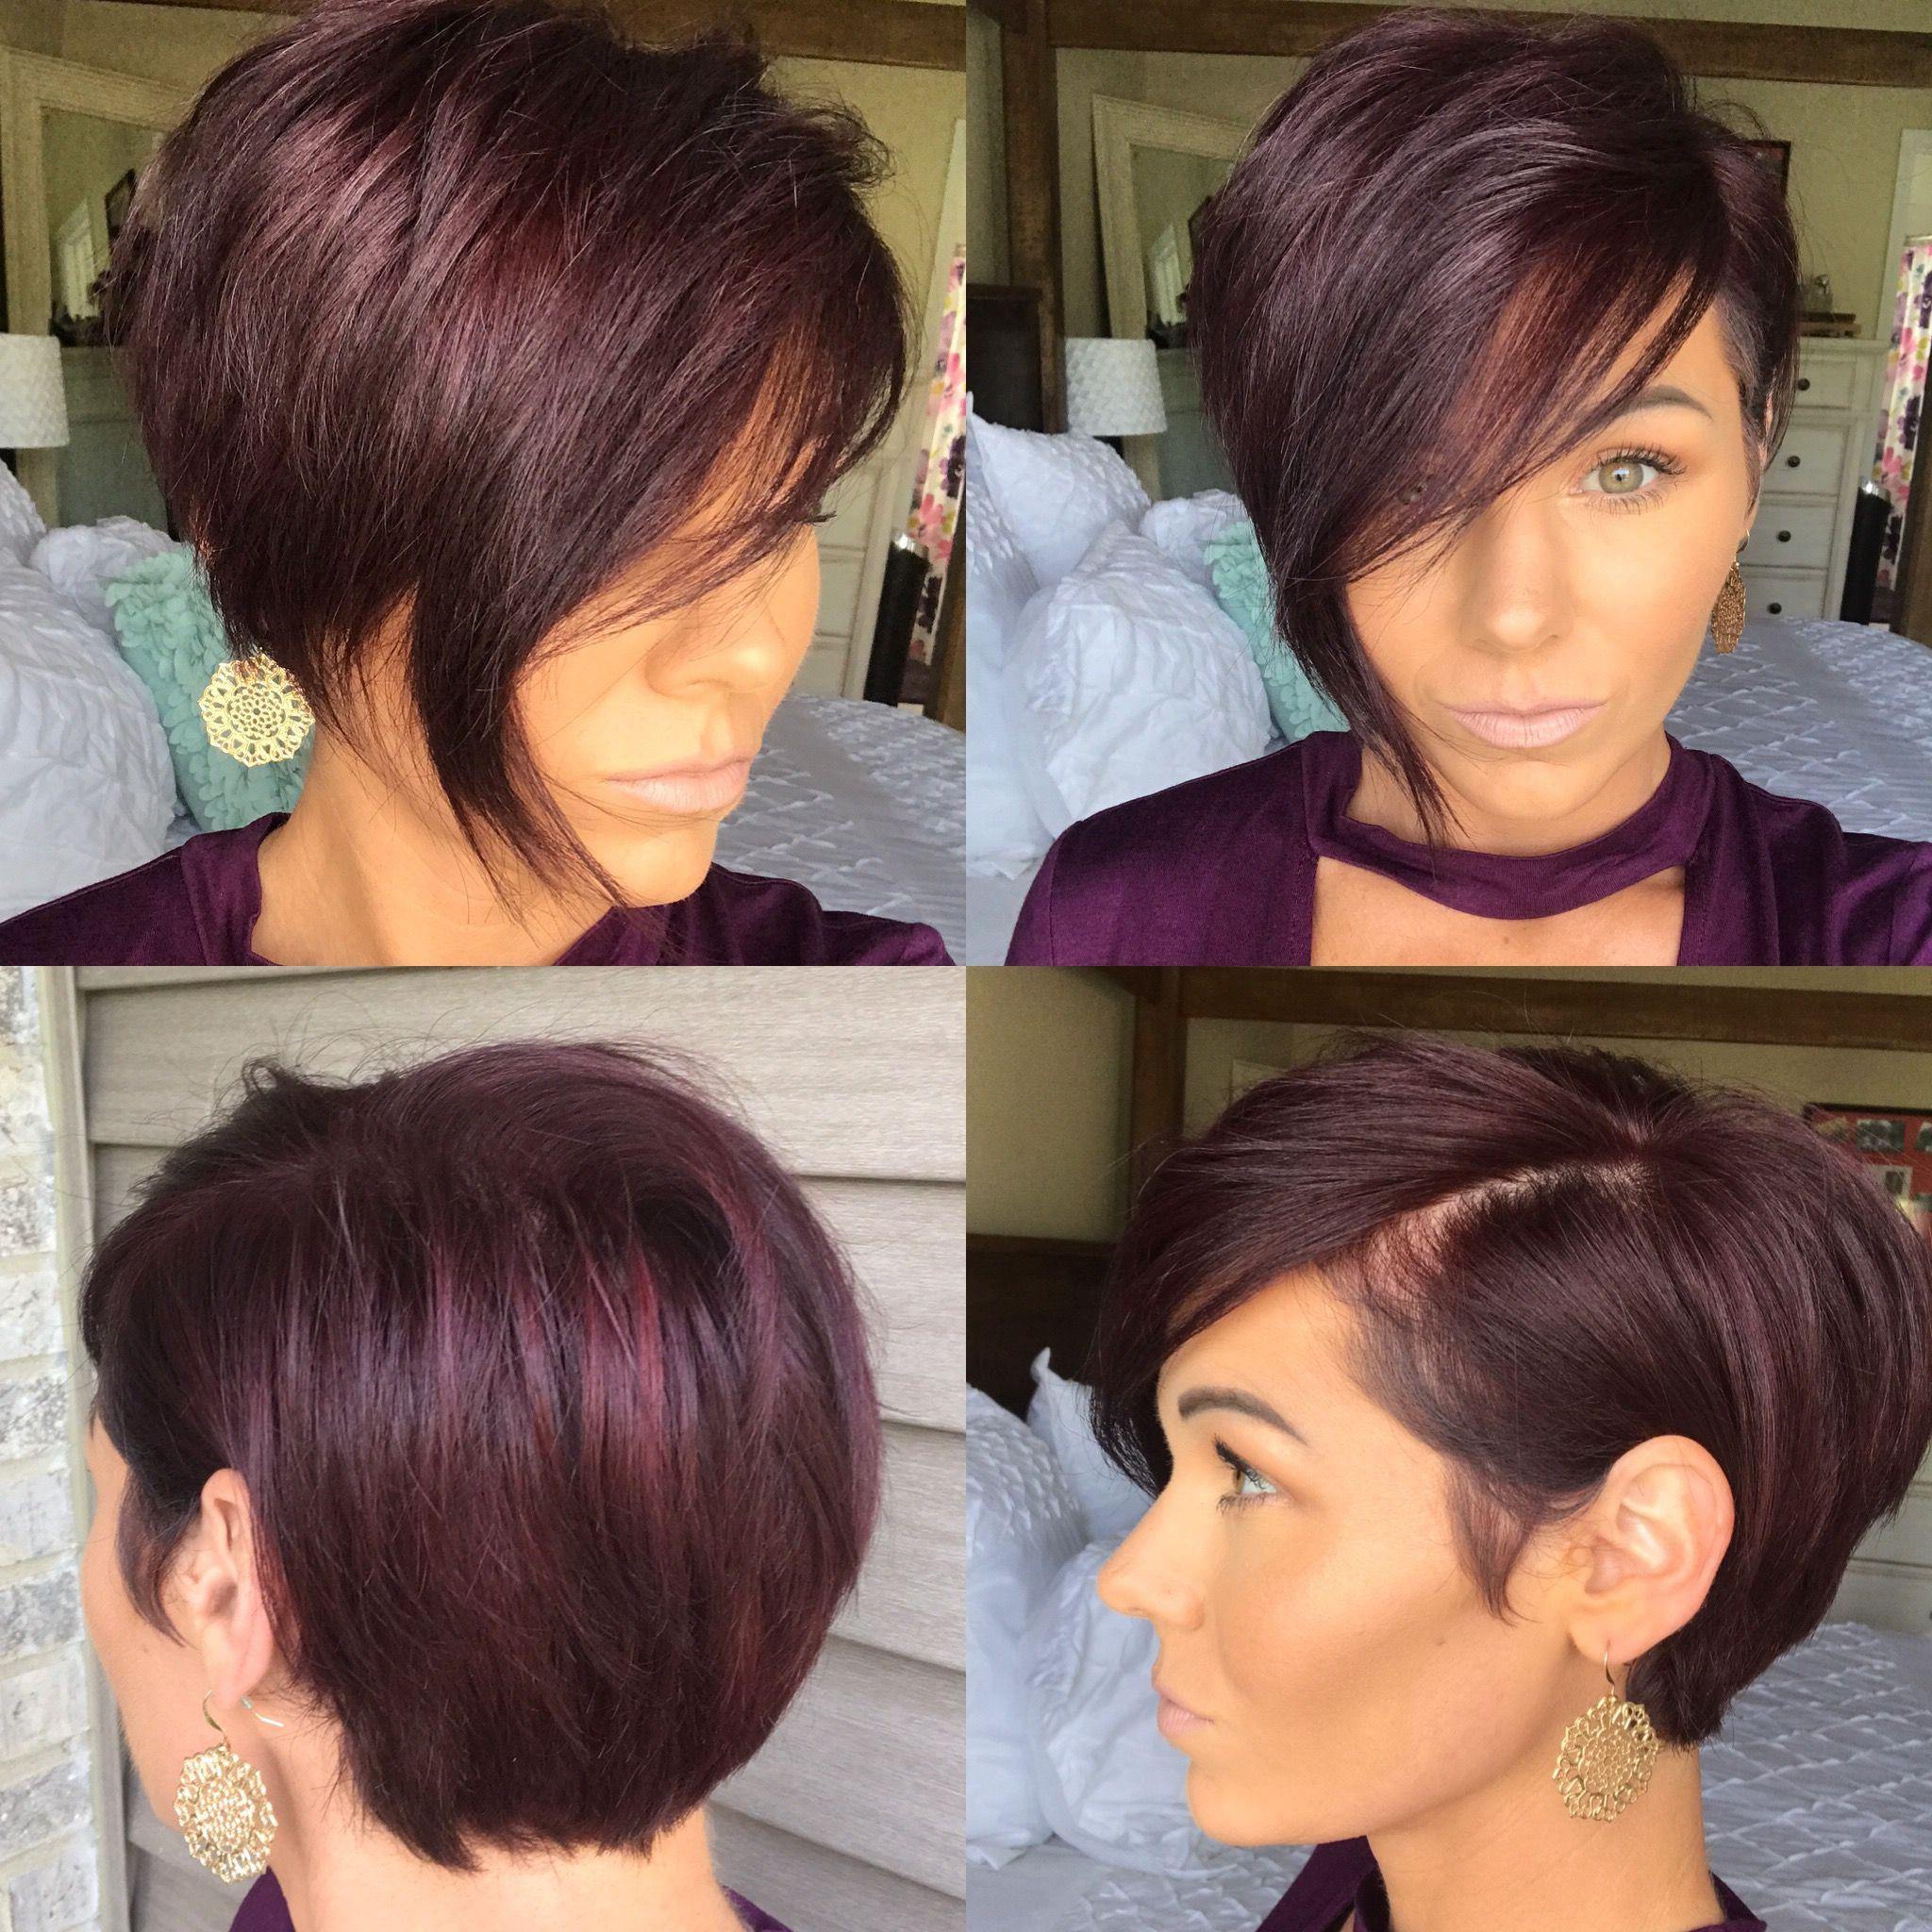 Adorable Asymmetrical Hairstyle | Hairdos | Pinterest | Asymmetrical Throughout Asymmetrical Pixie Bob Hairstyles (View 2 of 20)